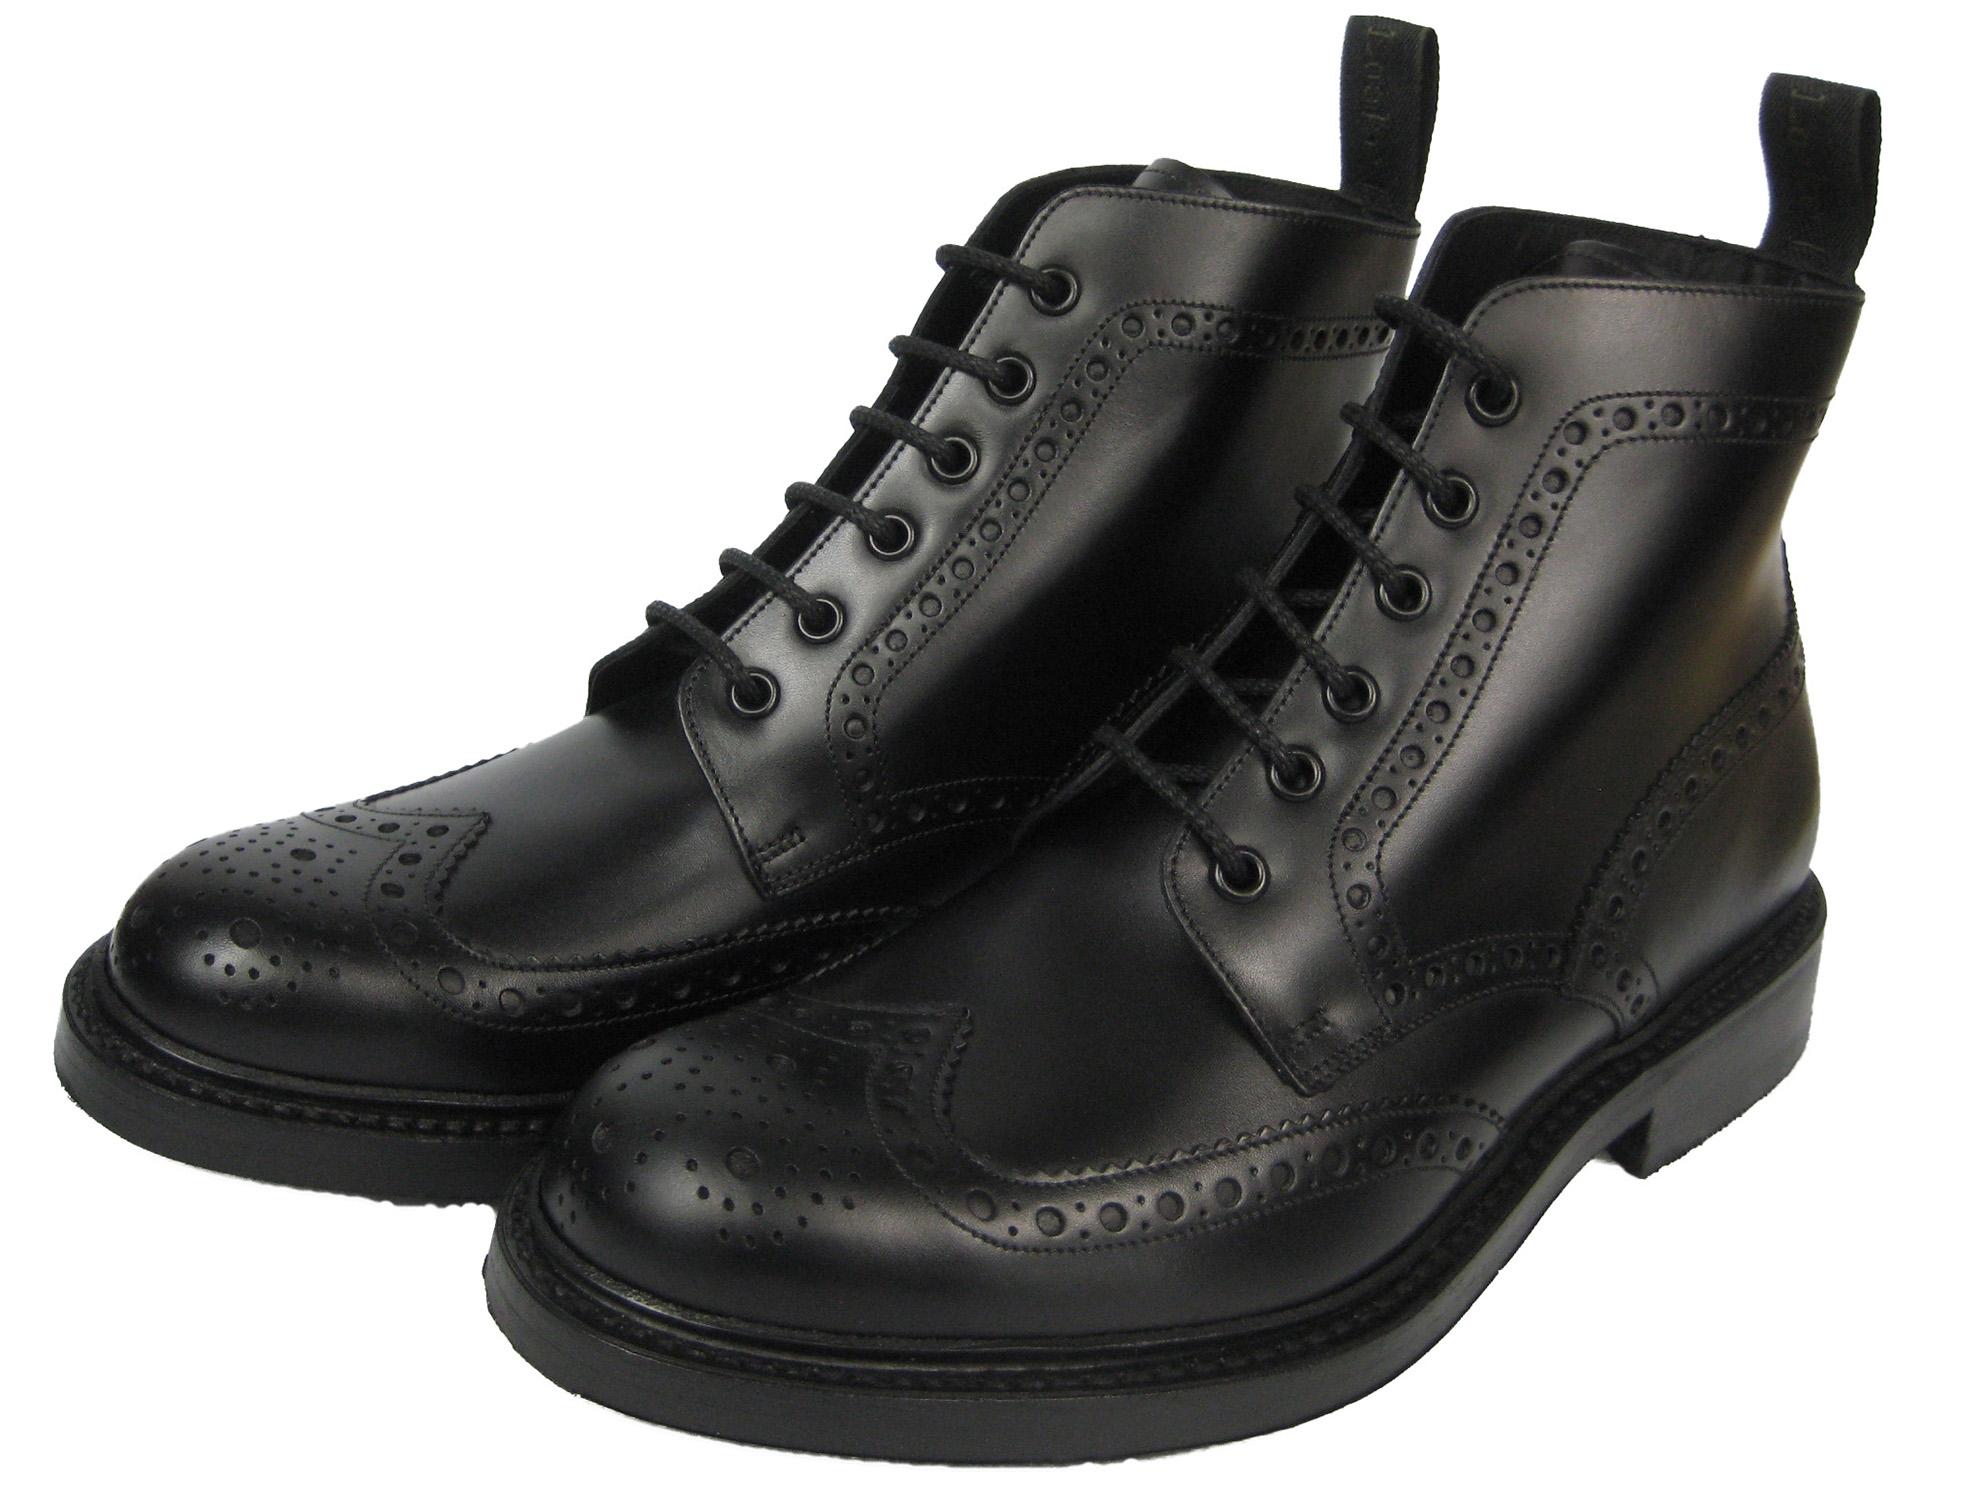 Alpha London Stiefel Brogue Budapester Boot Business Schuh Burgundy  5039